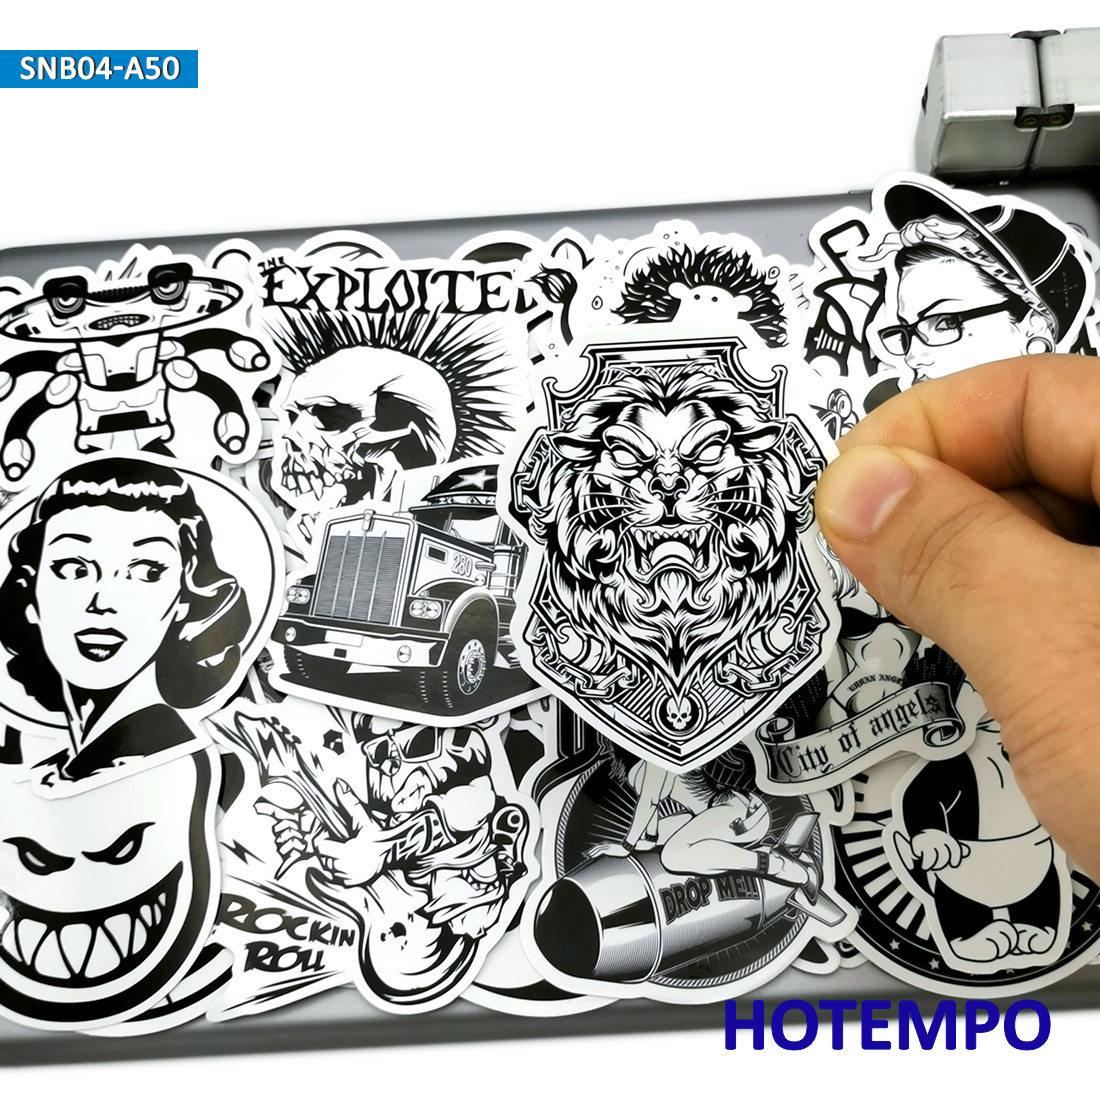 50pcs Black And White Graffiti Mix Funny Fashion Stickers For Mobile Phone Laptop Luggage Skateboard Bike Car Art Style Stickers